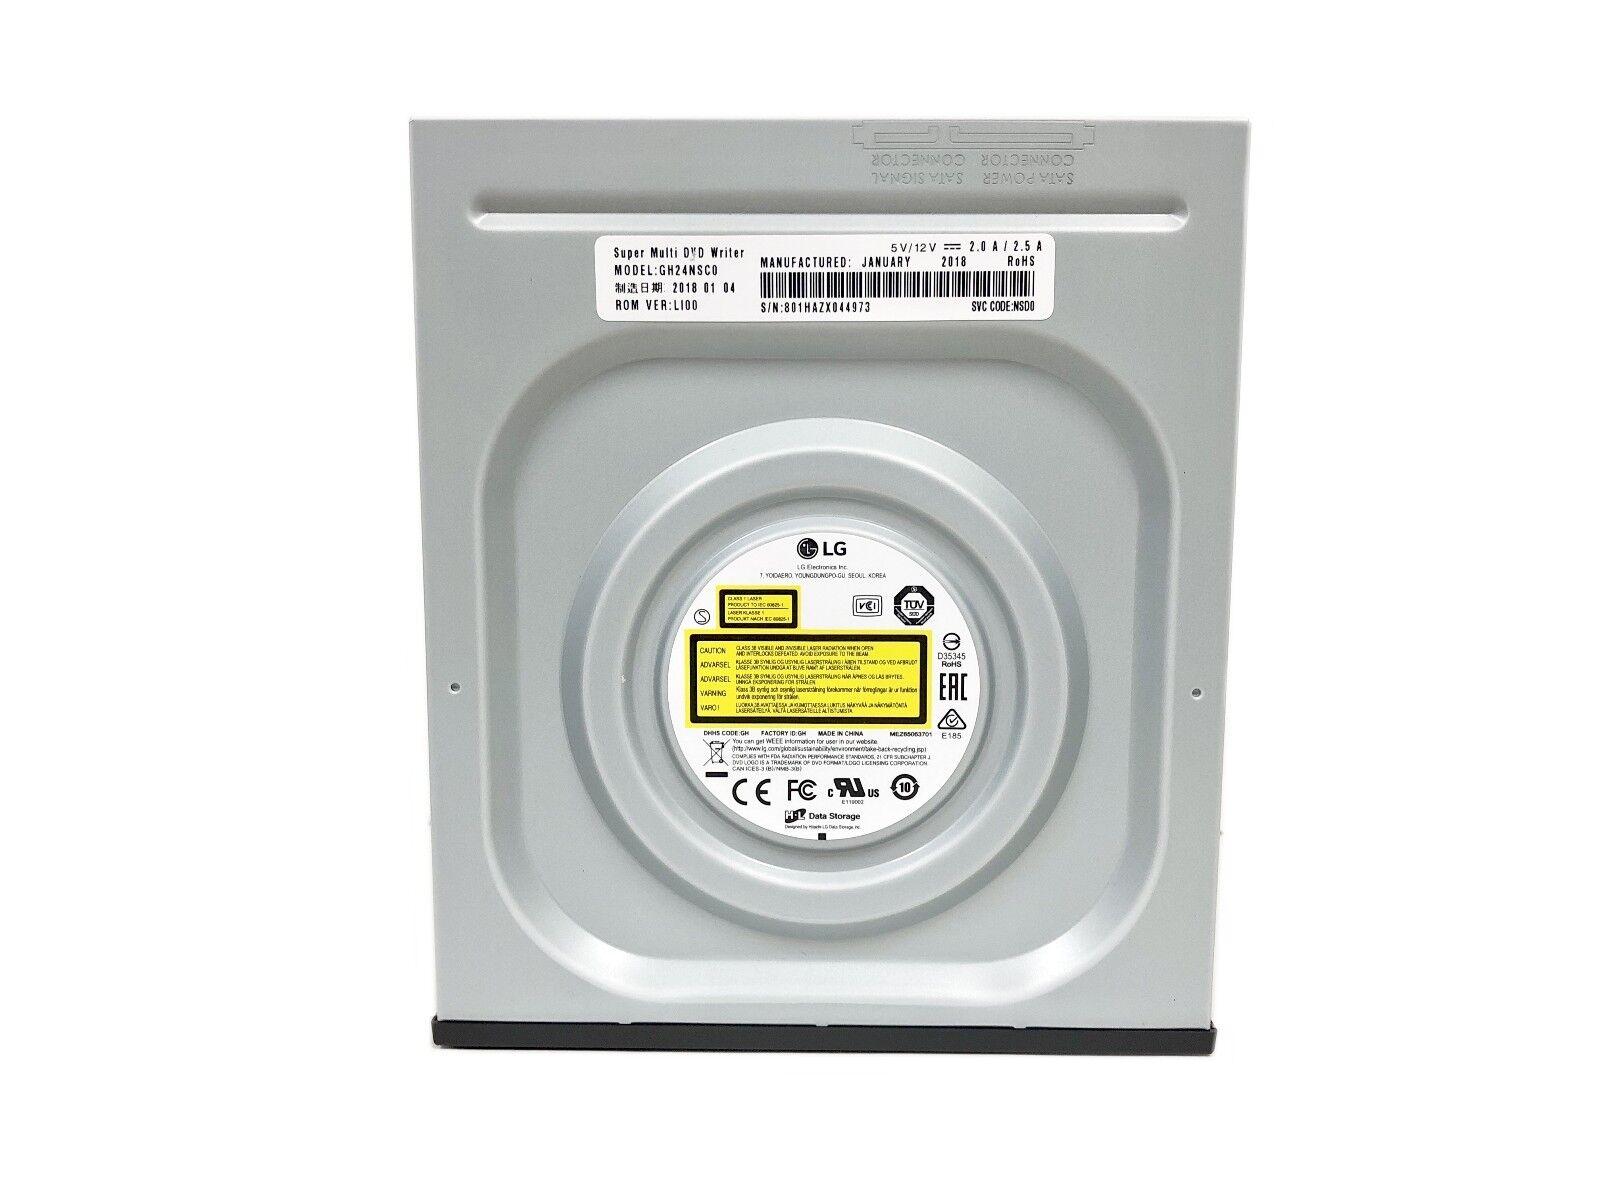 LG Internal SATA 24x DVD CD +/-R & RW DL Disc Burner Re-Writer Drive OEM Bulk